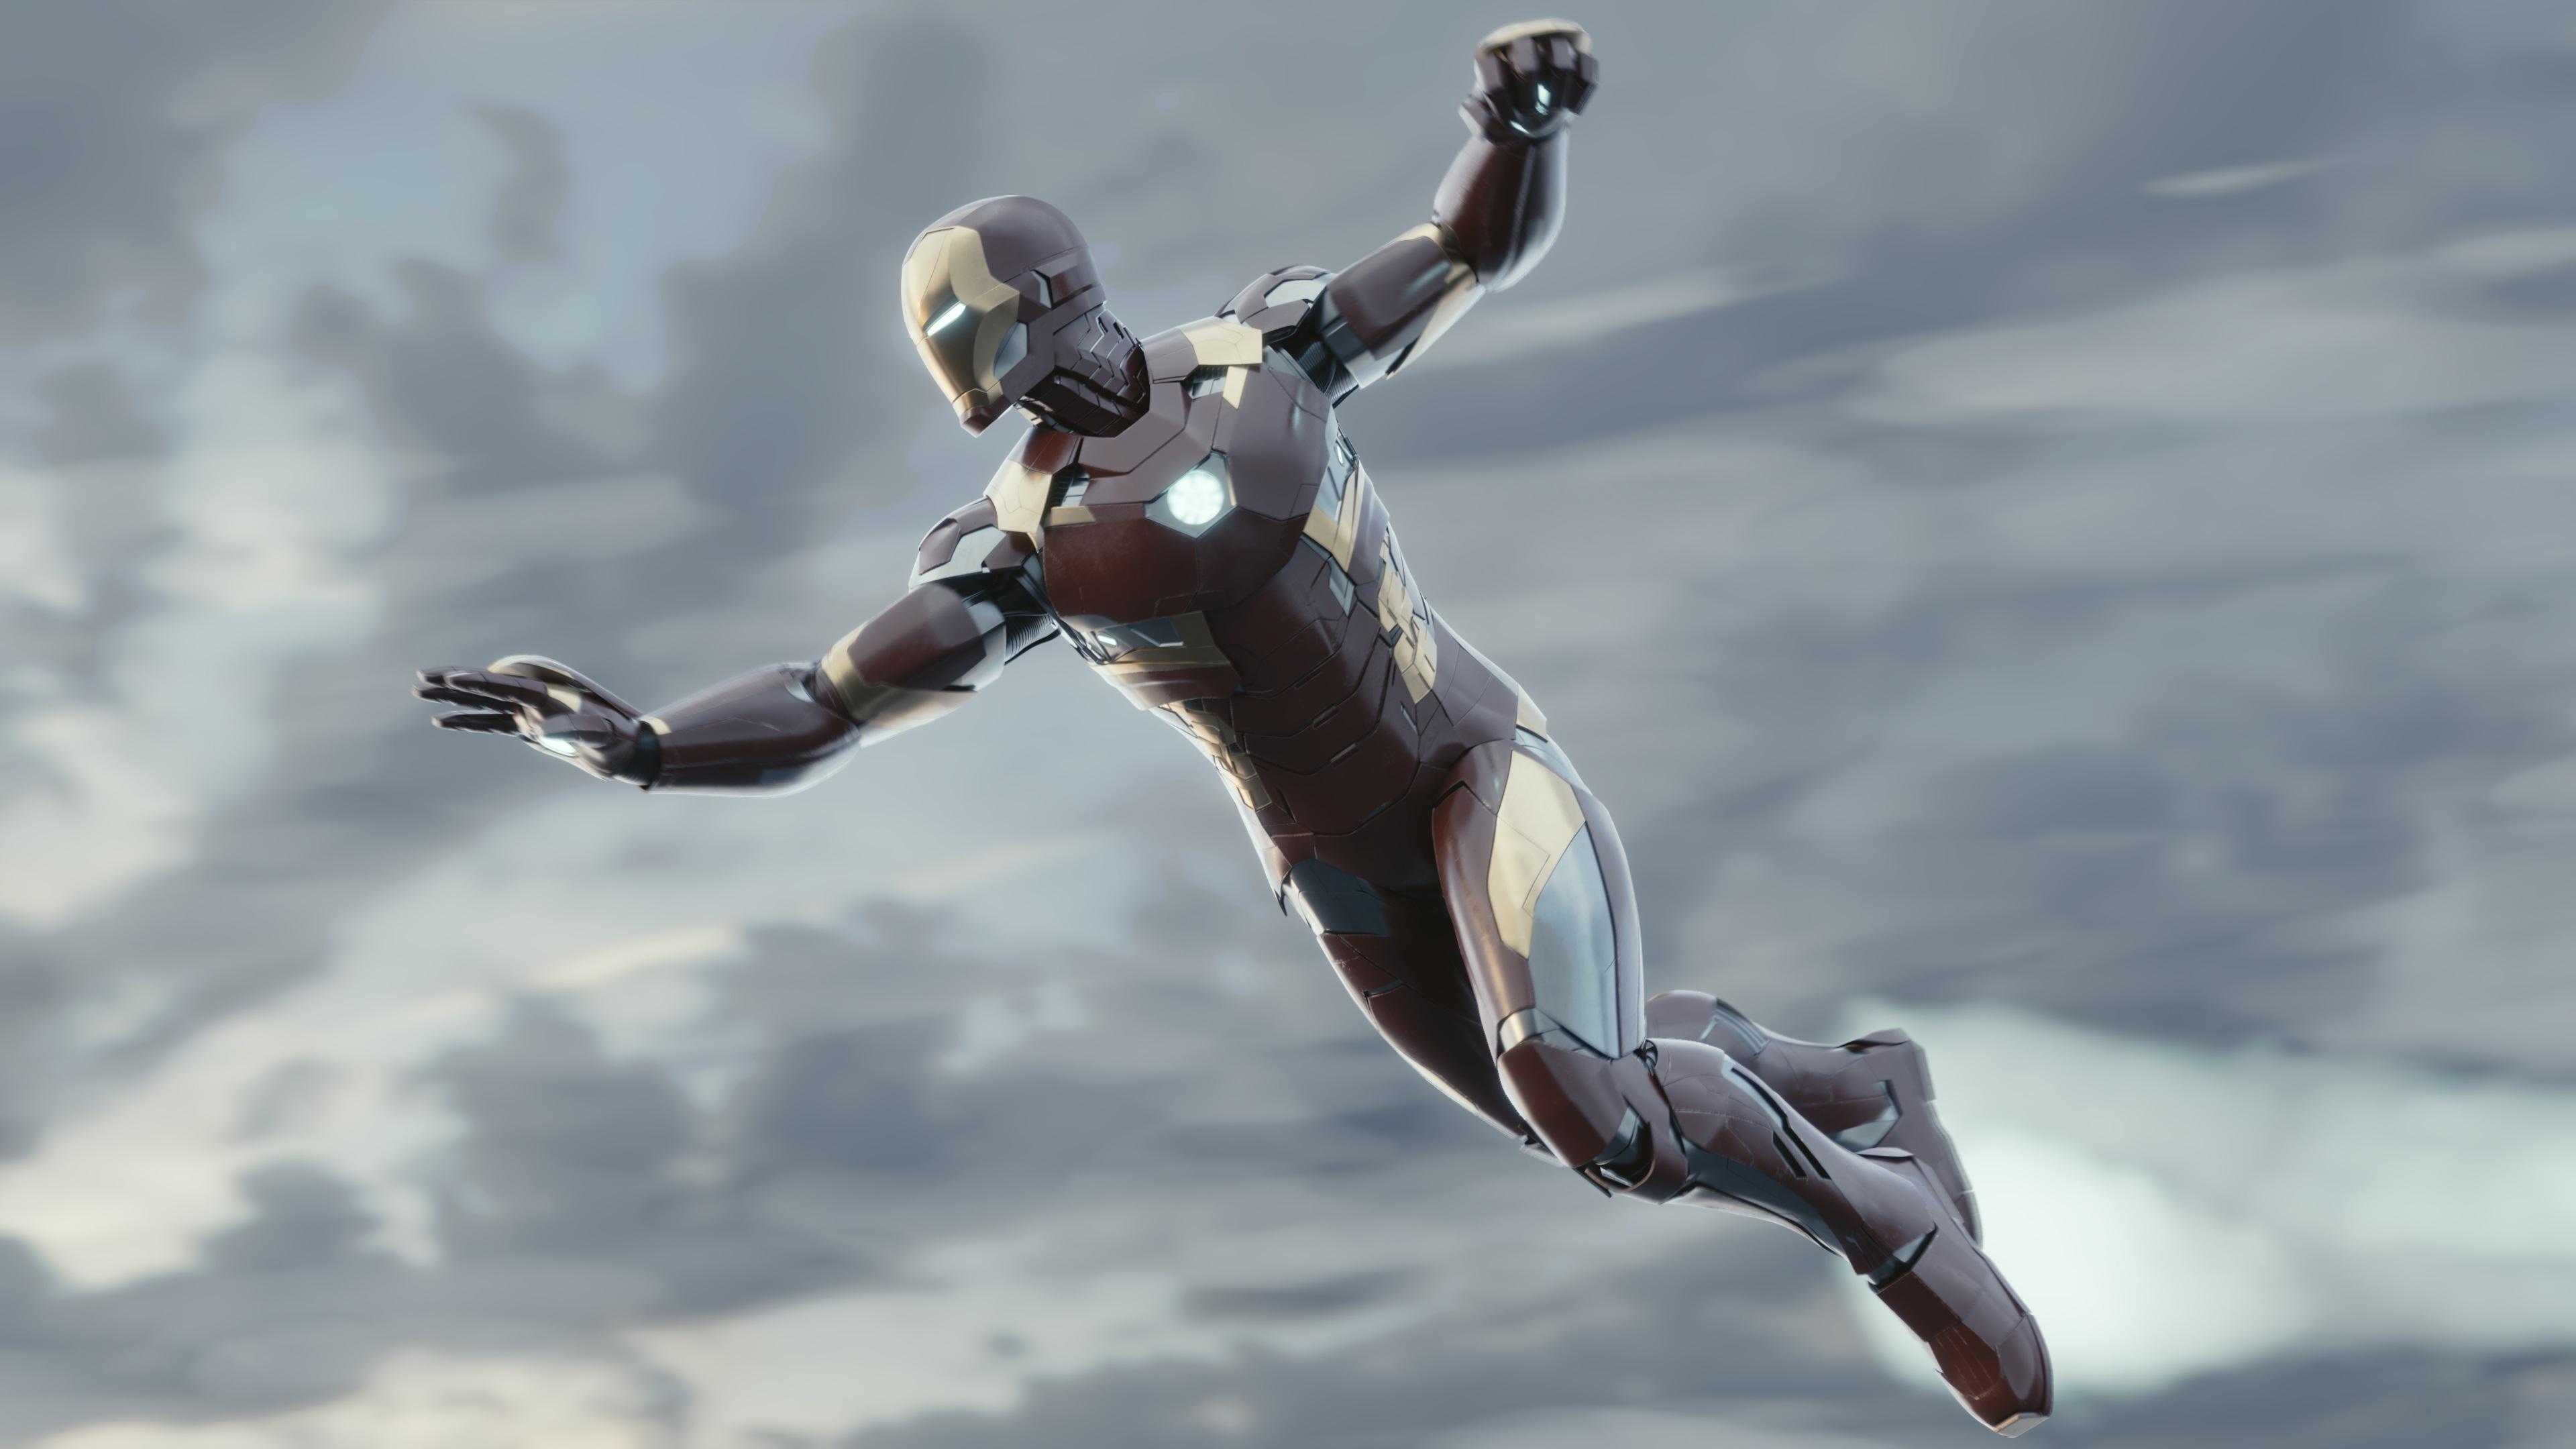 4k new iron man 1553071912 - 4k New Iron Man - superheroes wallpapers, iron man wallpapers, hd-wallpapers, deviantart wallpapers, artwork wallpapers, artist wallpapers, 4k-wallpapers